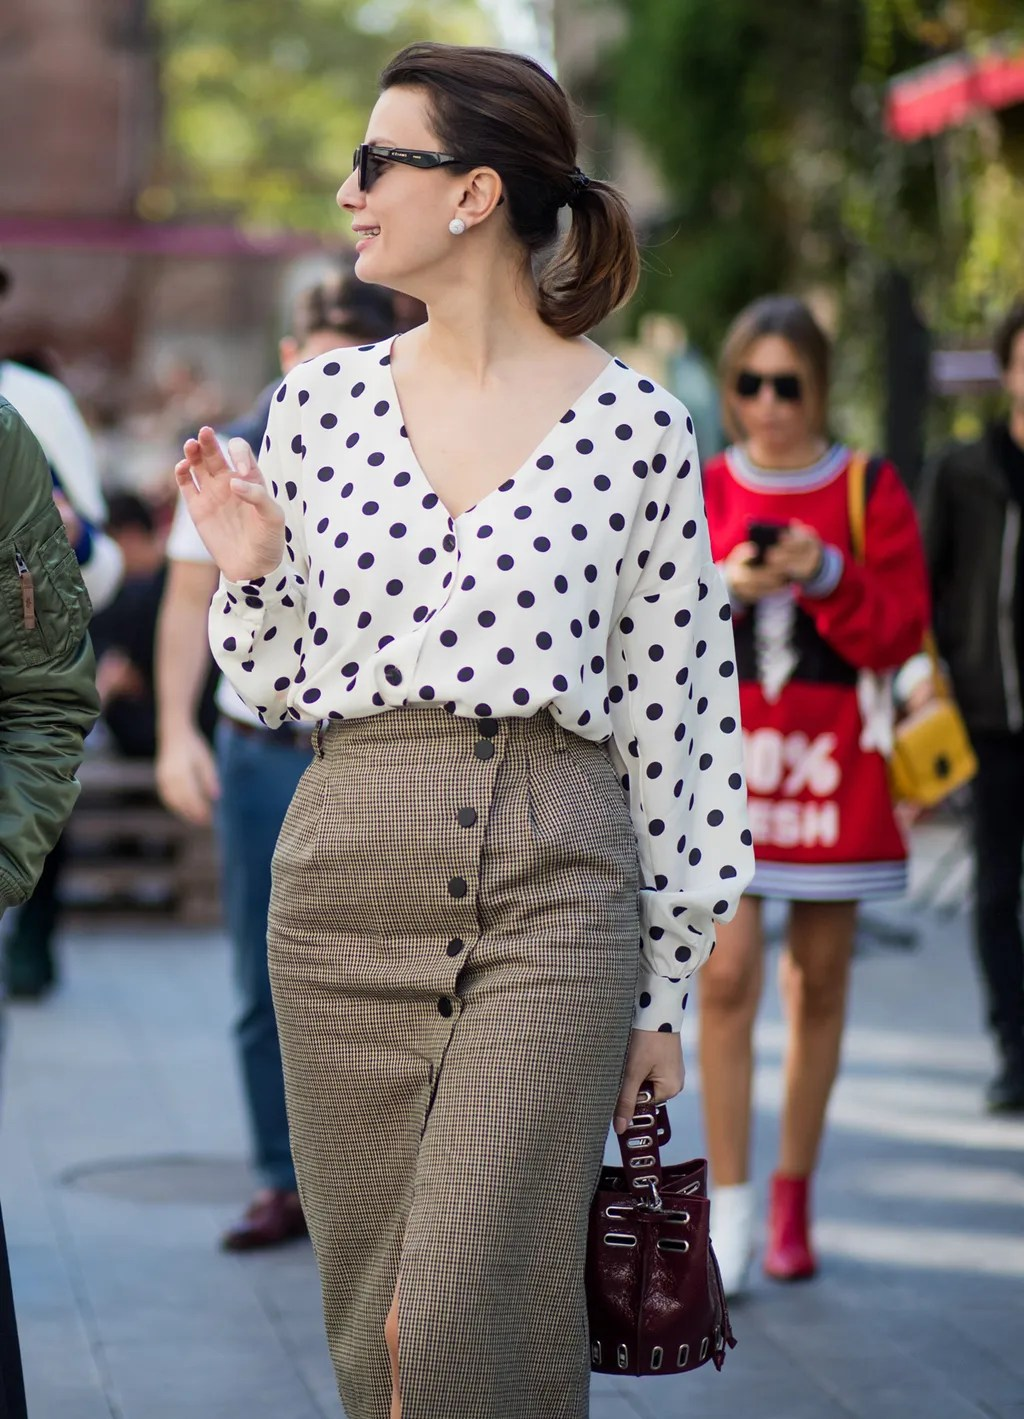 Spring 2018 Wardrobe Essentials: Polka-Dot Top